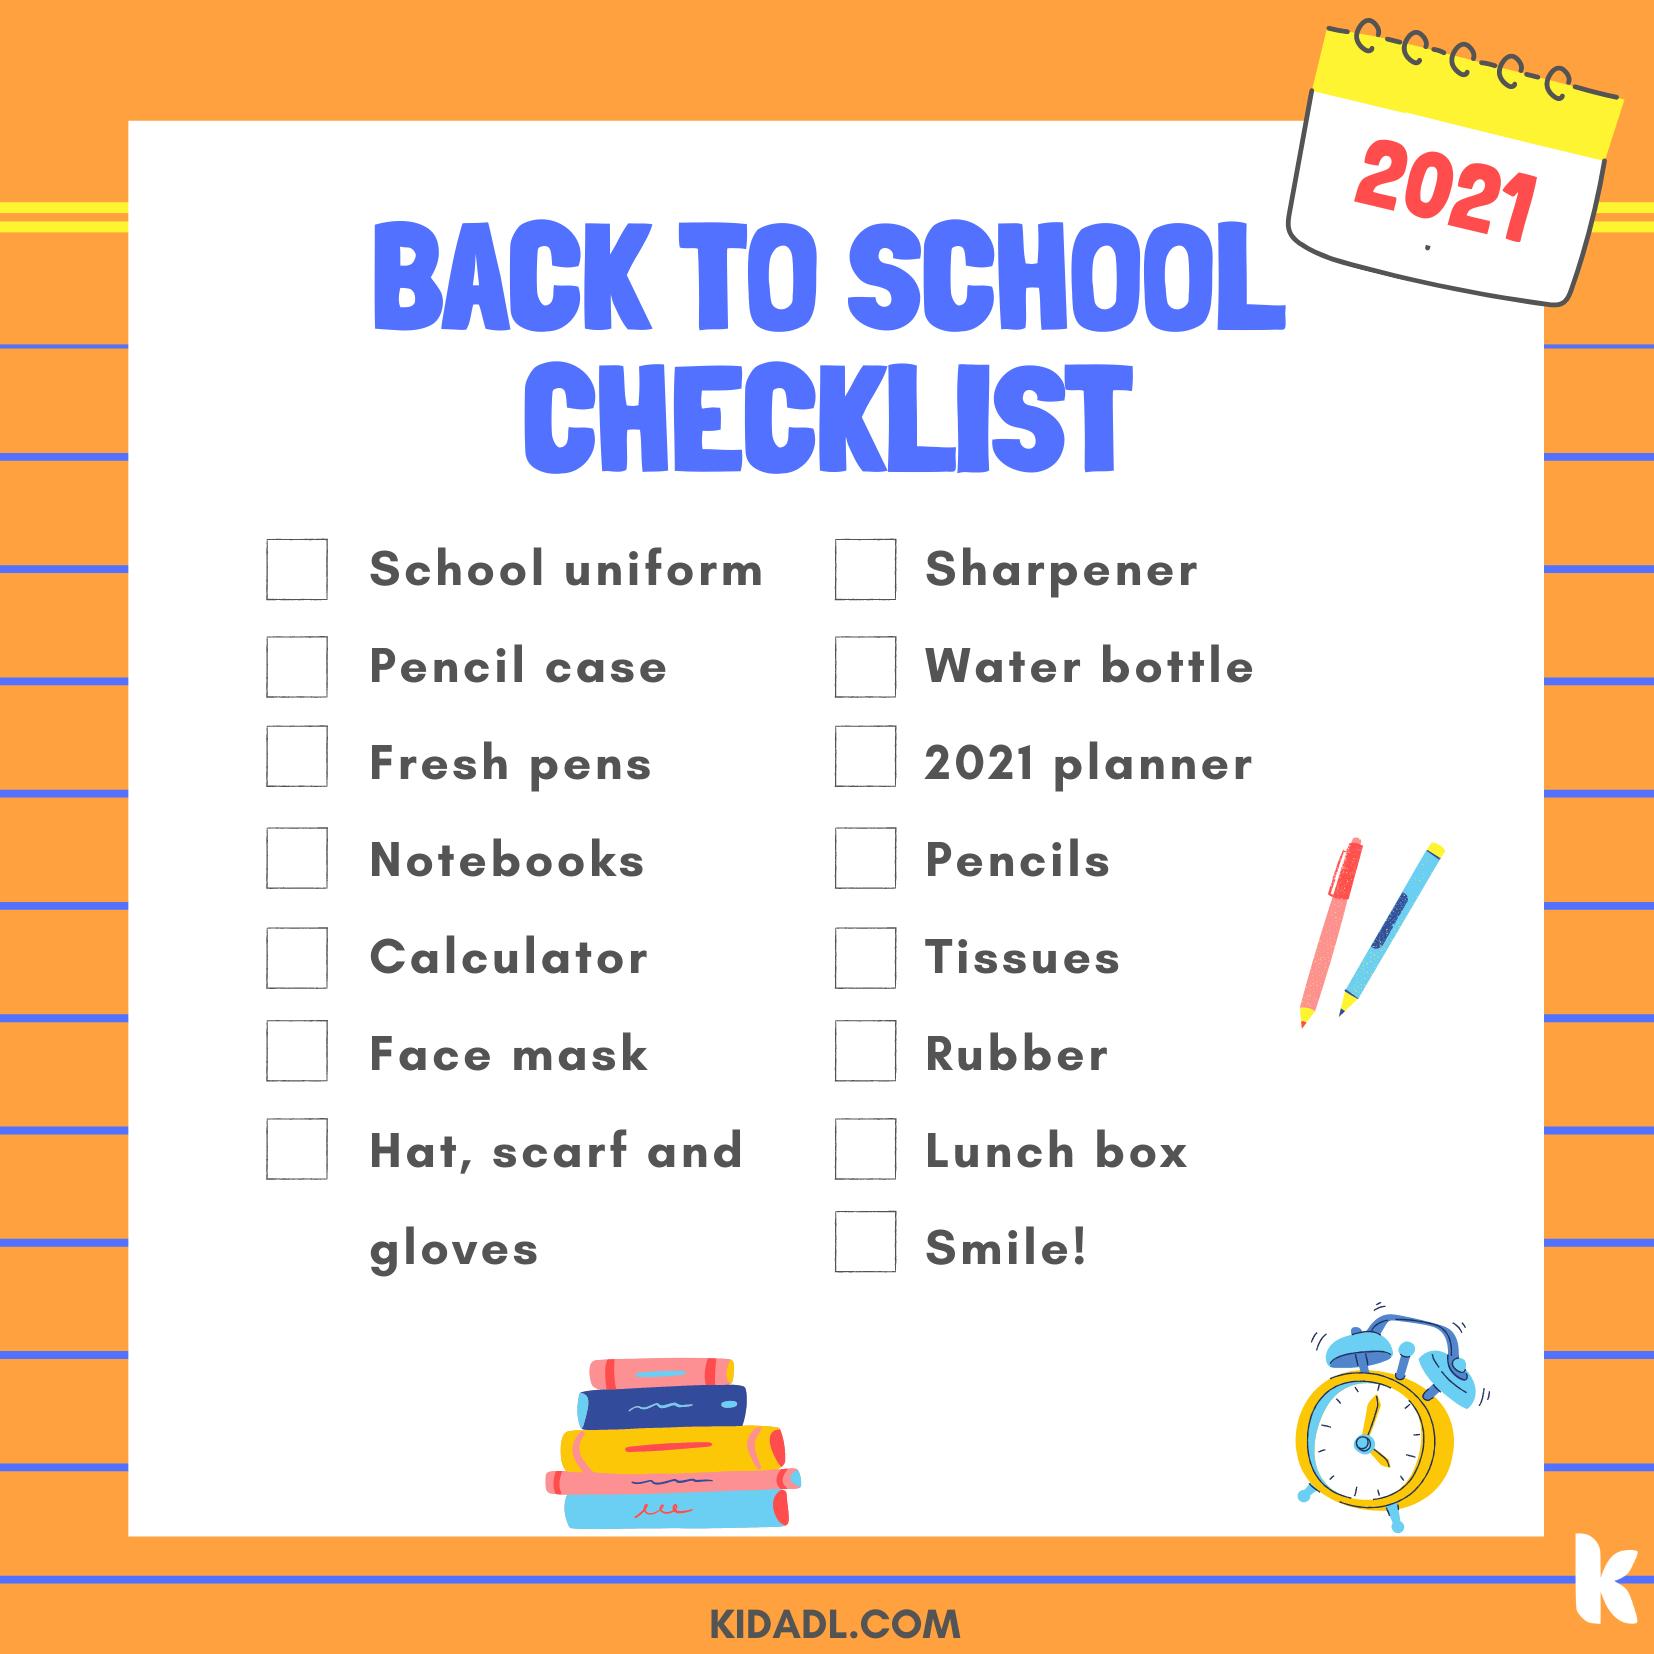 Read this back to School Bingo checklist to prepare for school.g